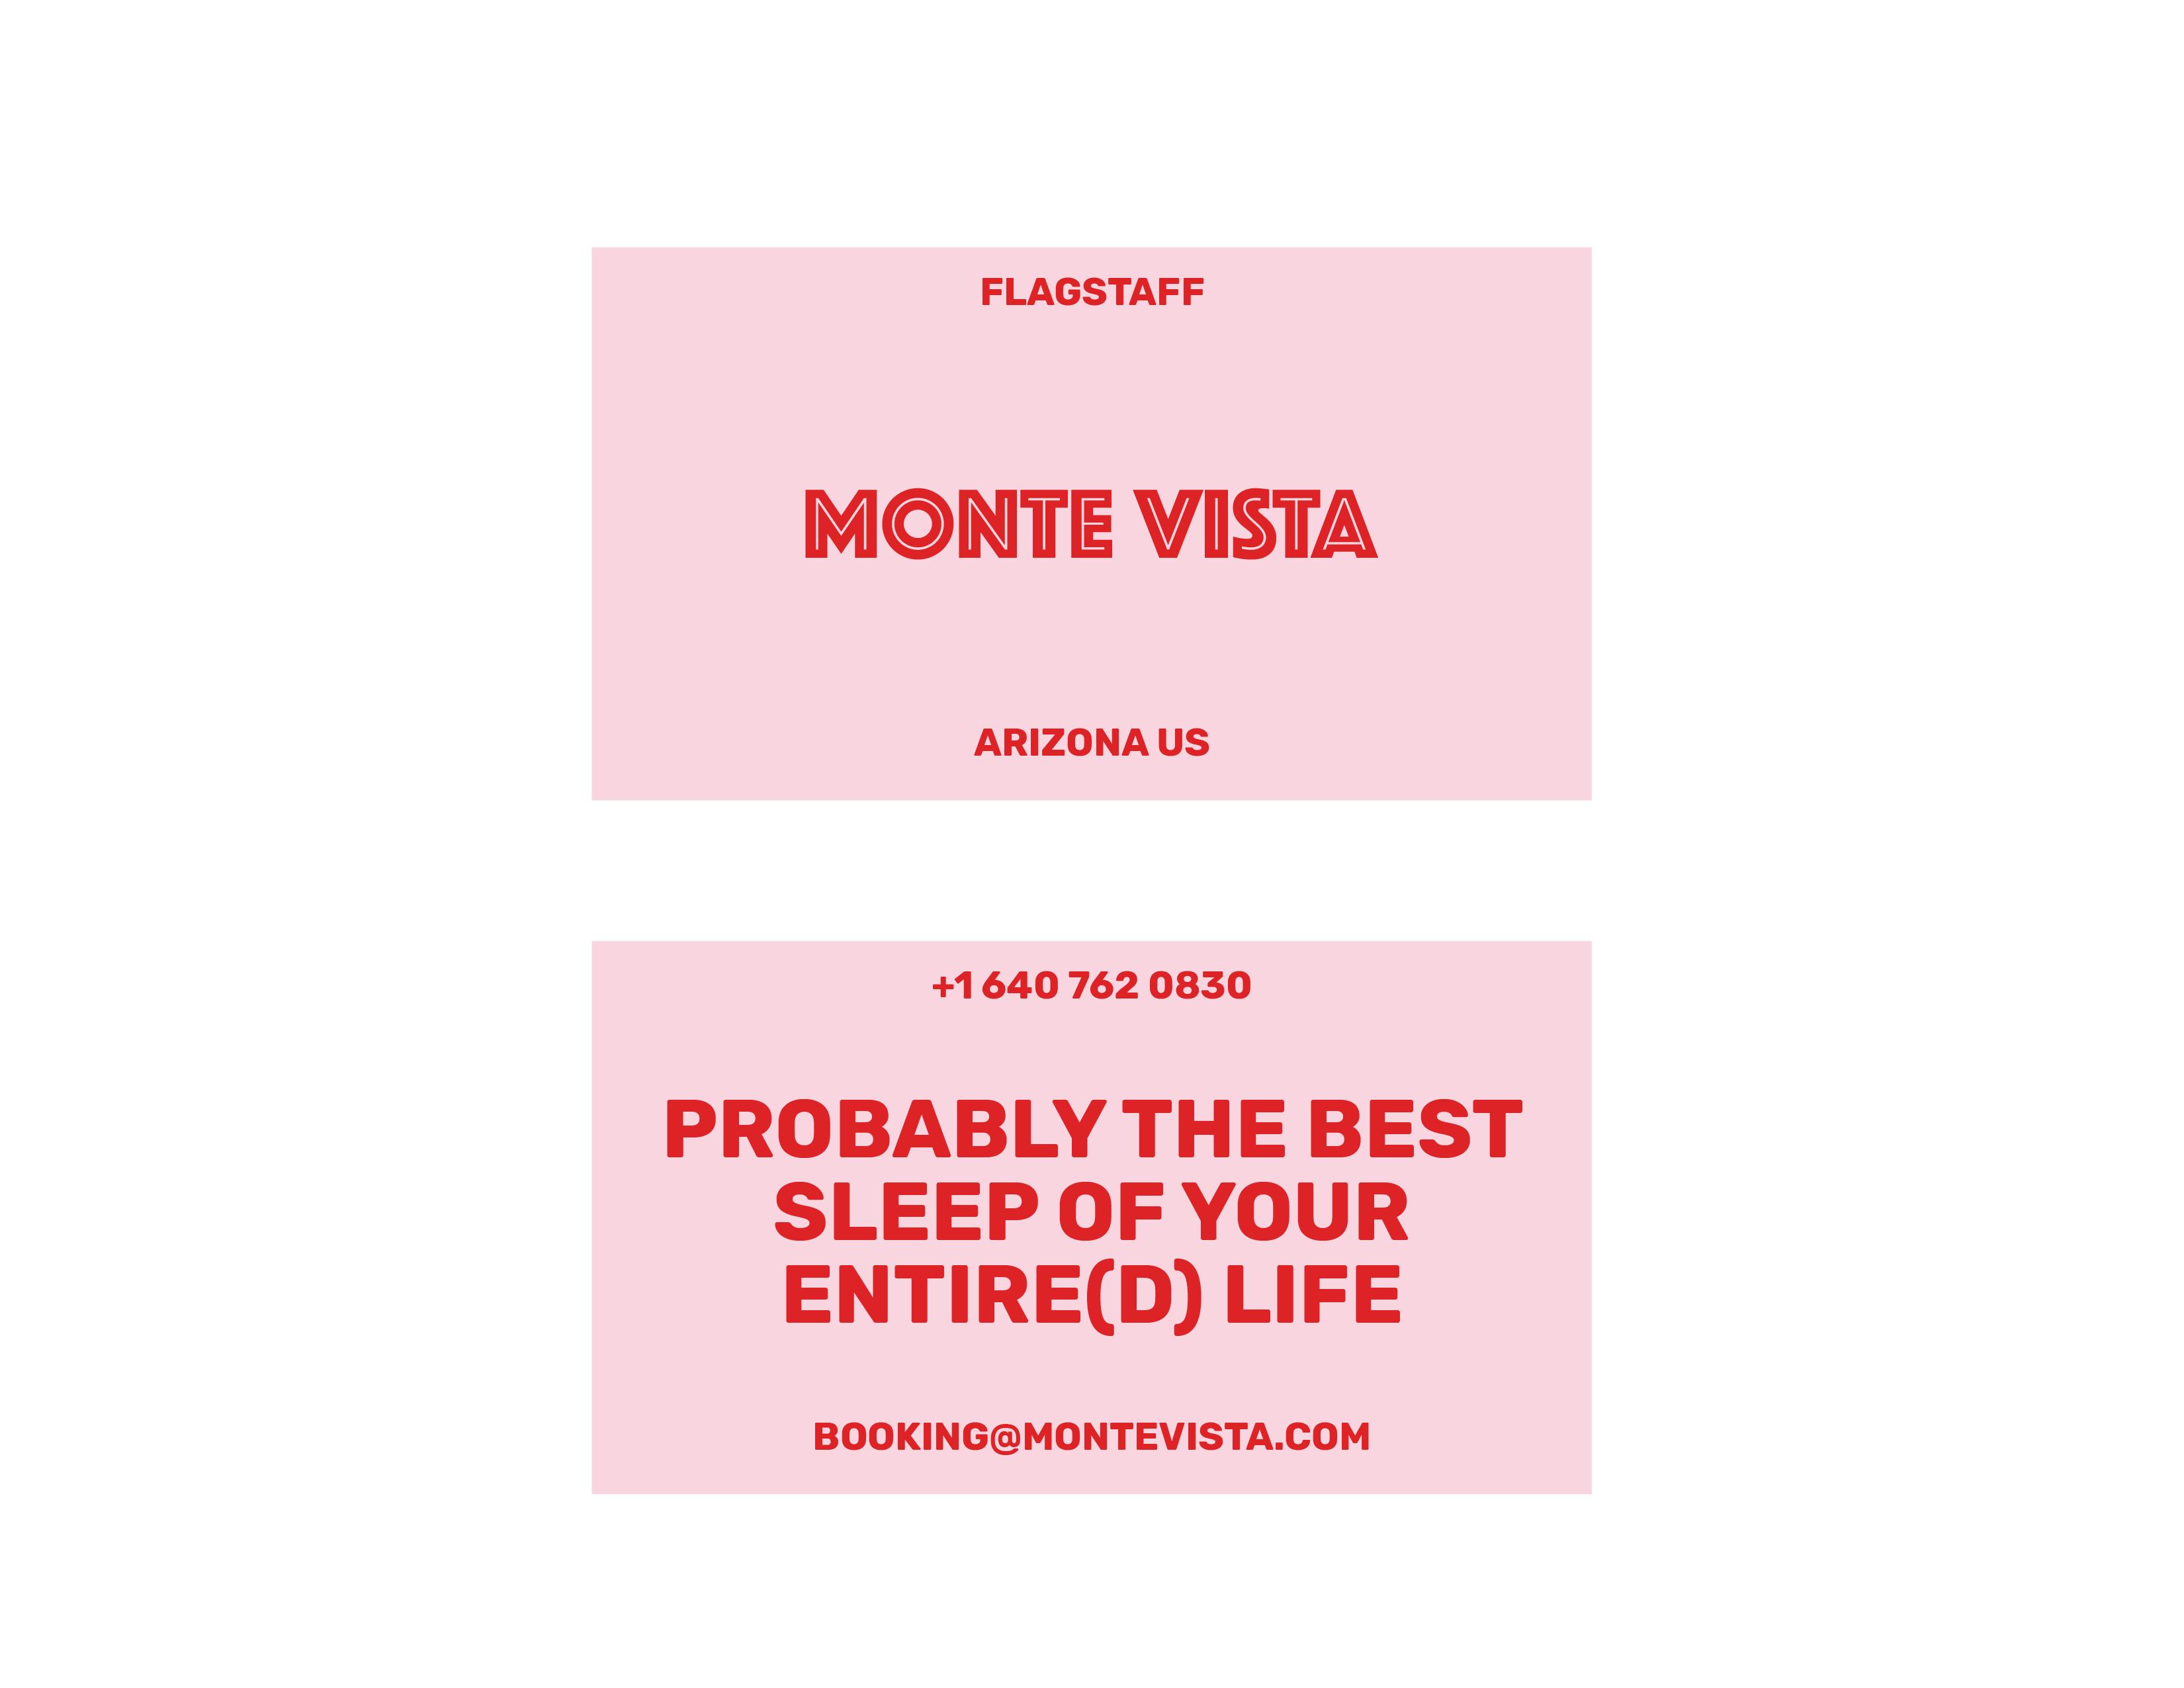 brandpad_template_hotel_monte_vista_transparent-05